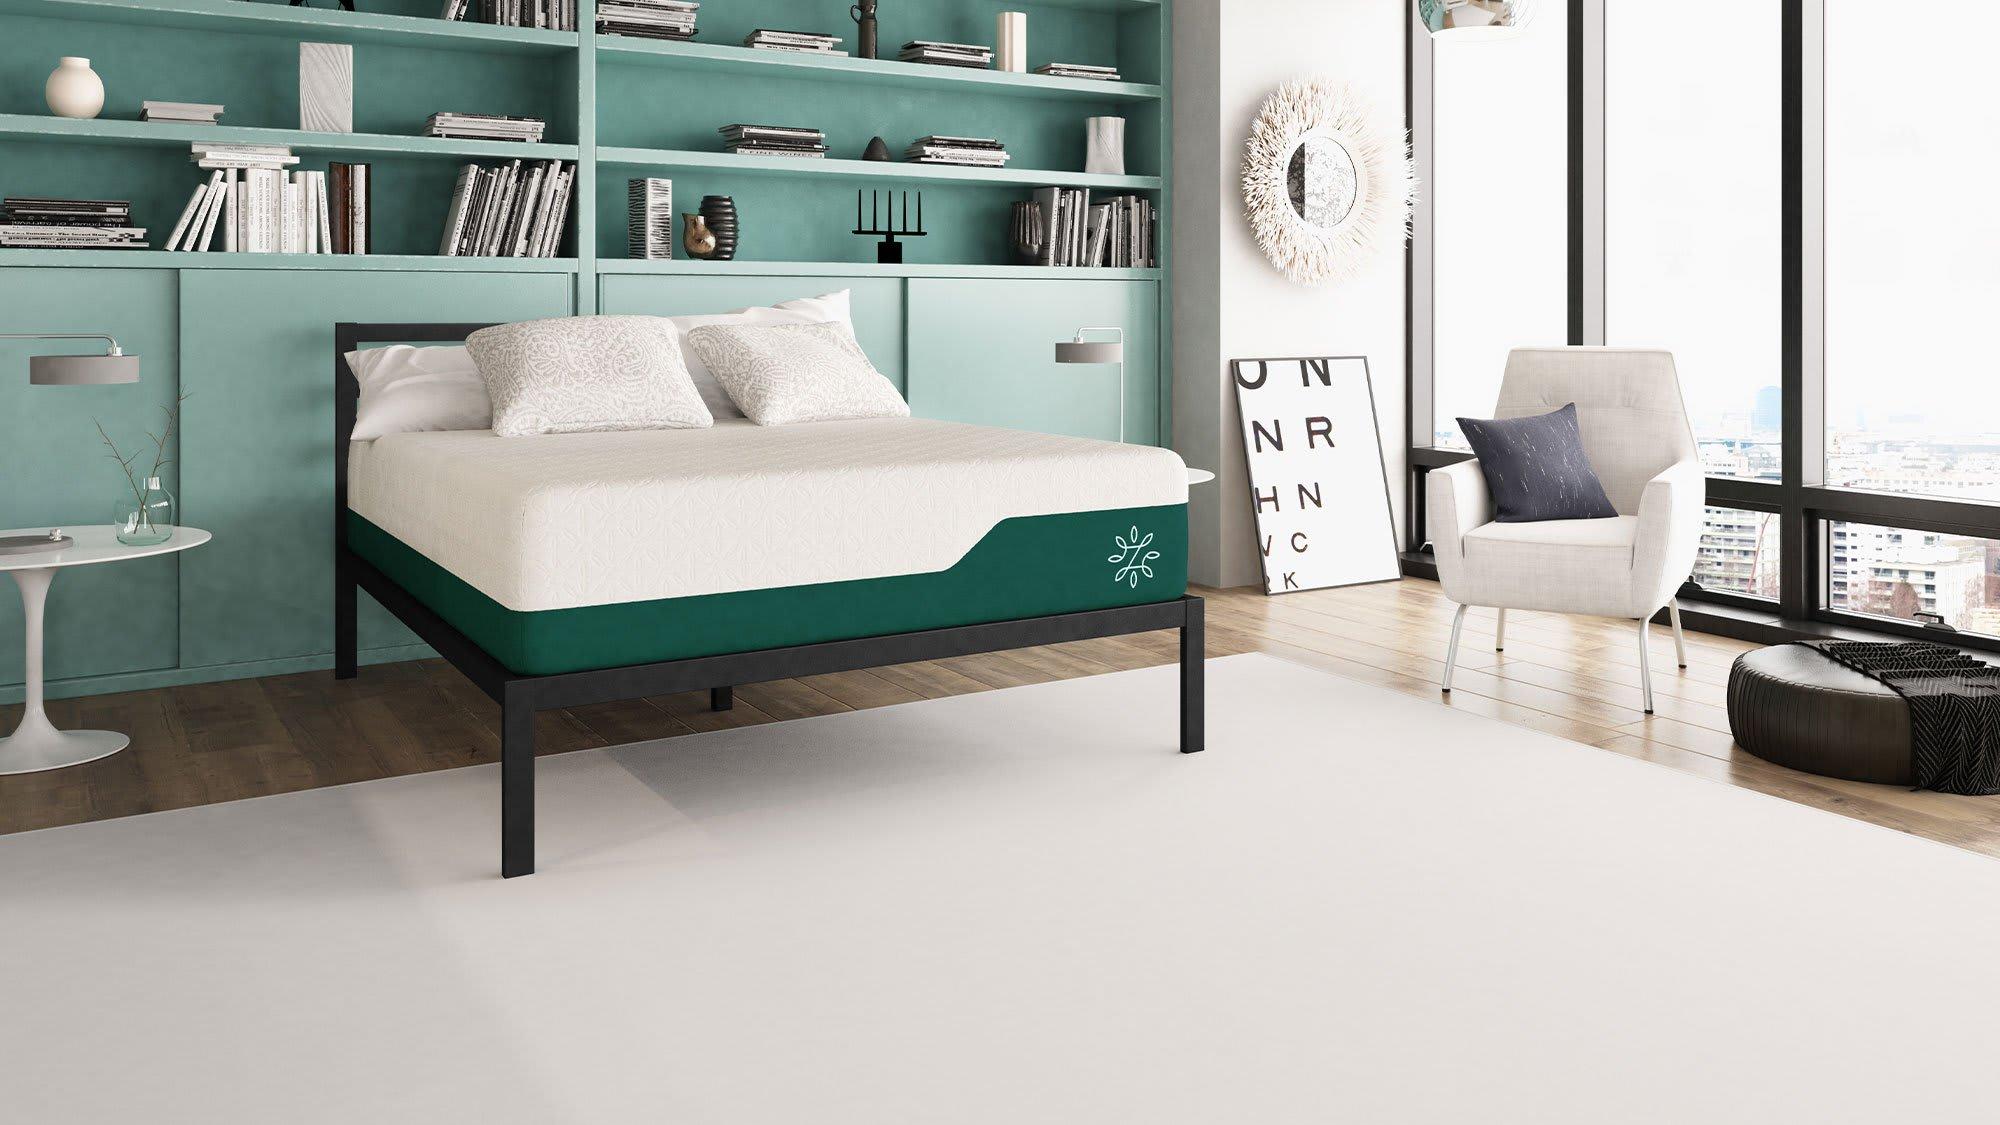 Memory Foam Mattress, Green Tea, Pressure Relief, Cooling Gel | Zinus